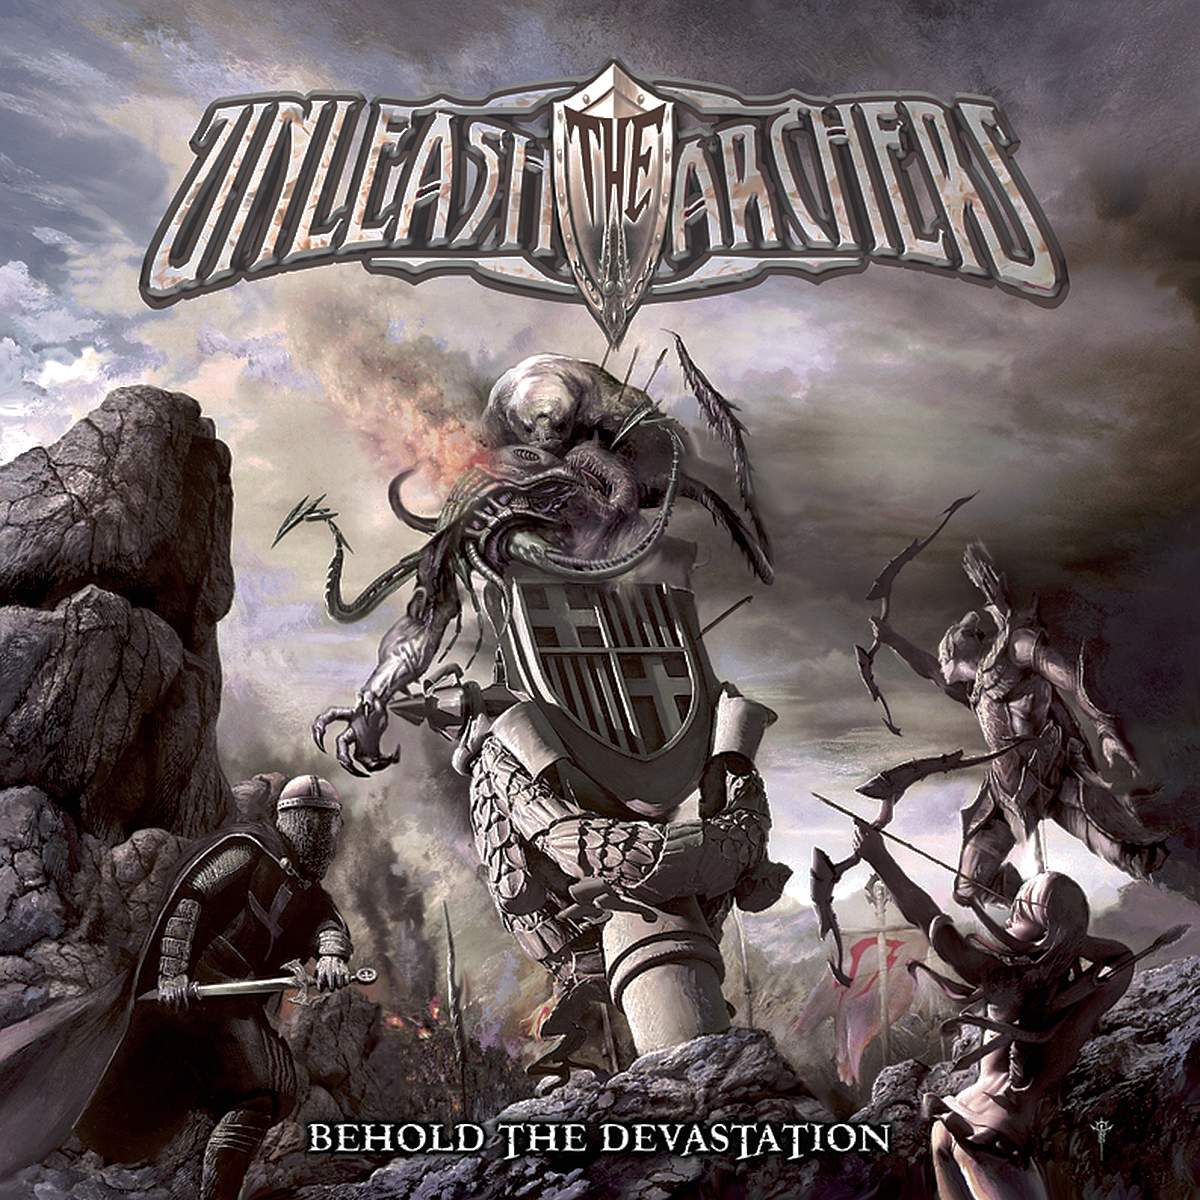 Unleash the Archers - Behold the Devastation